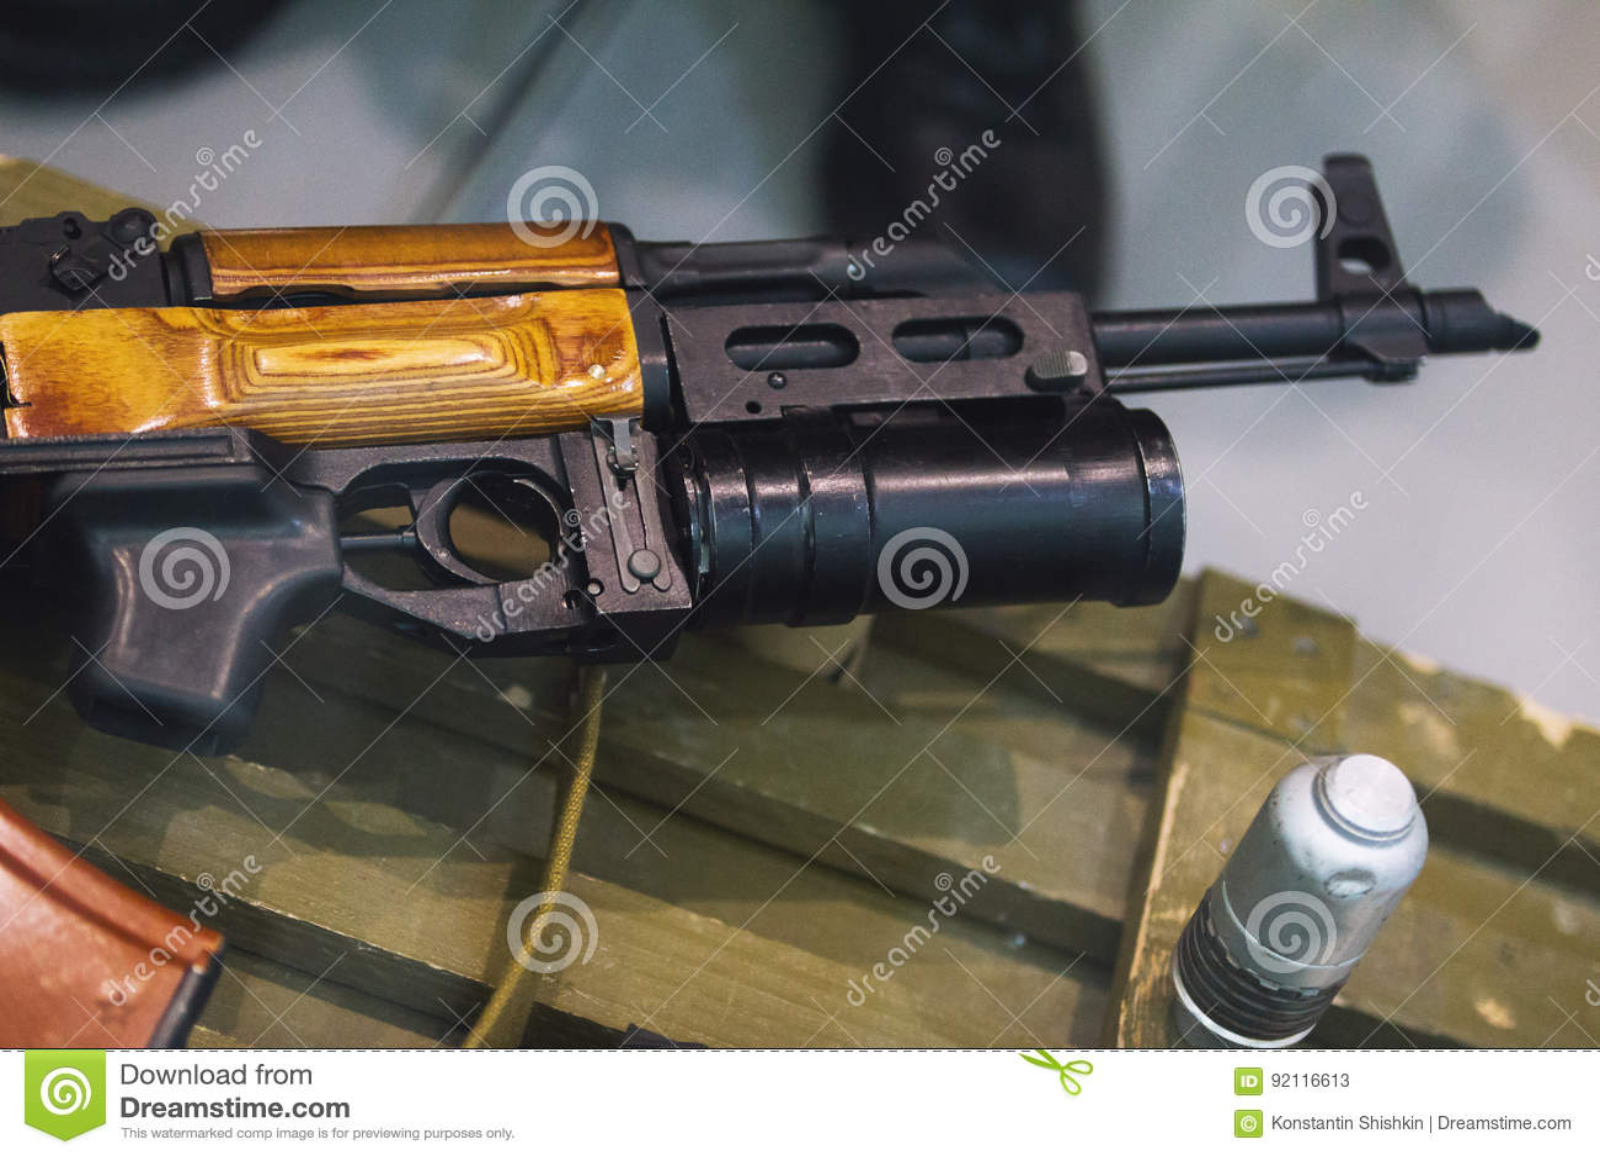 Kalashnikov Rifle With Underbarrel Grenade Launcher, Close